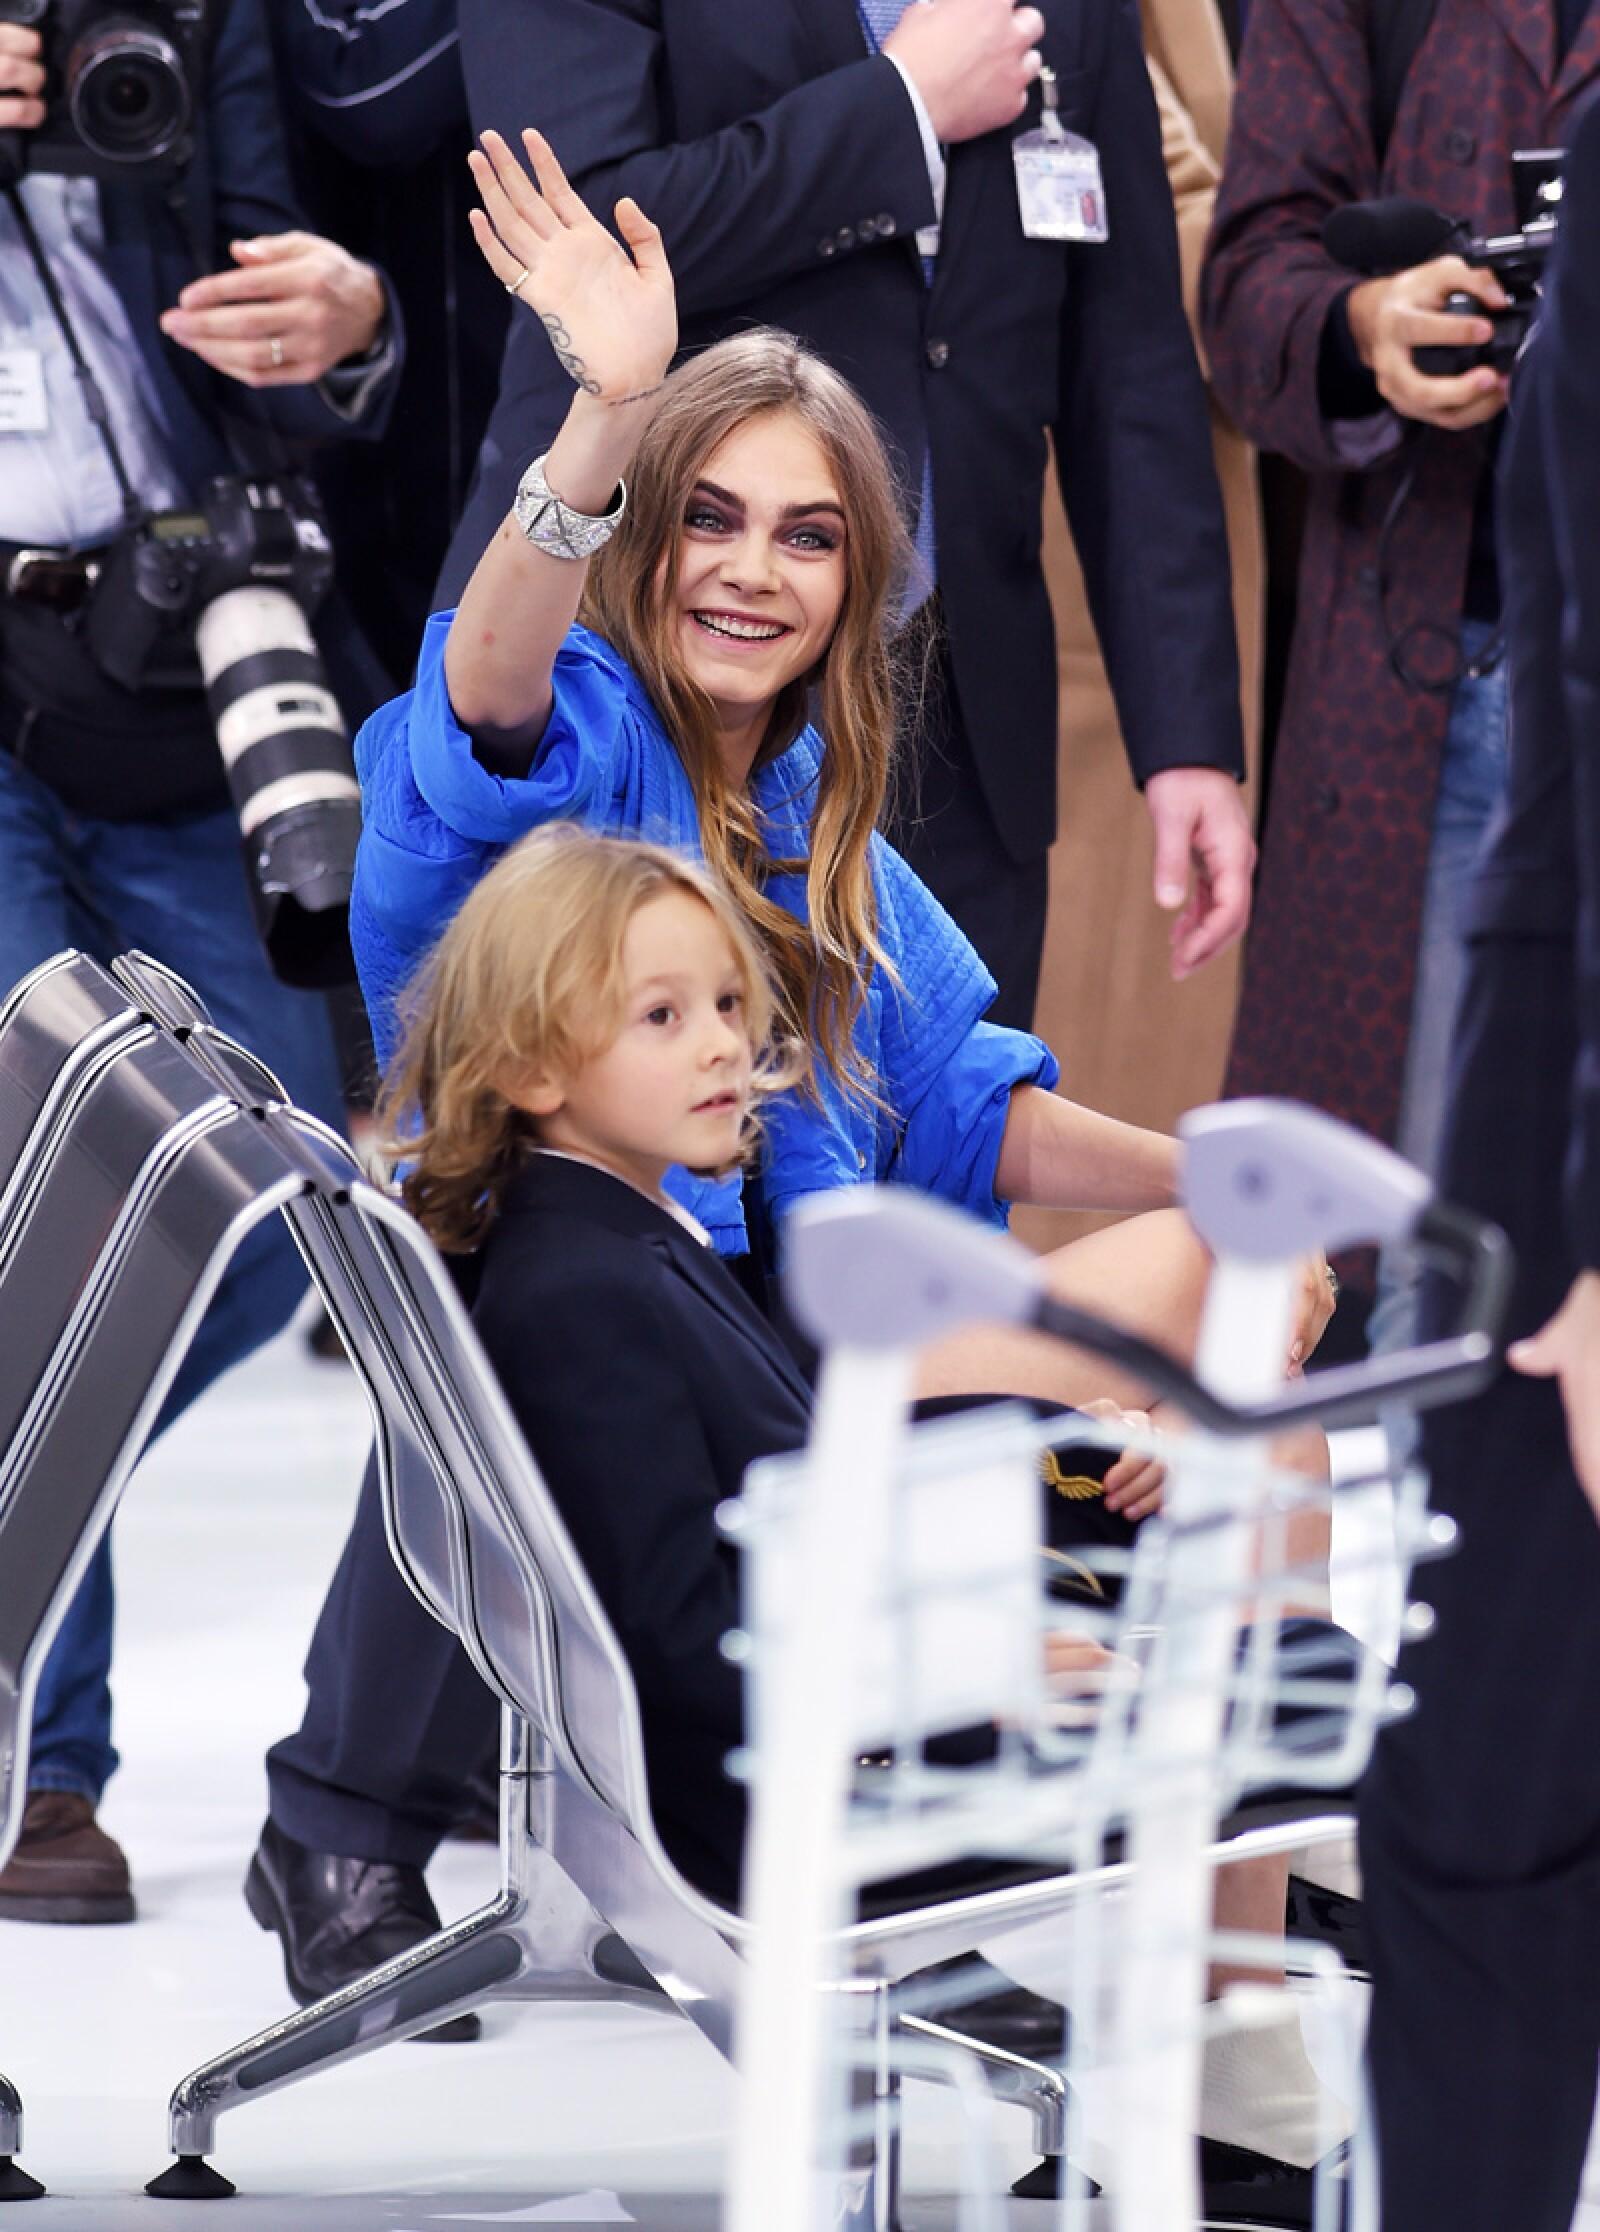 Chanel show, Spring Summer 2016, Paris Fashion Week, France - 06 Oct 2015